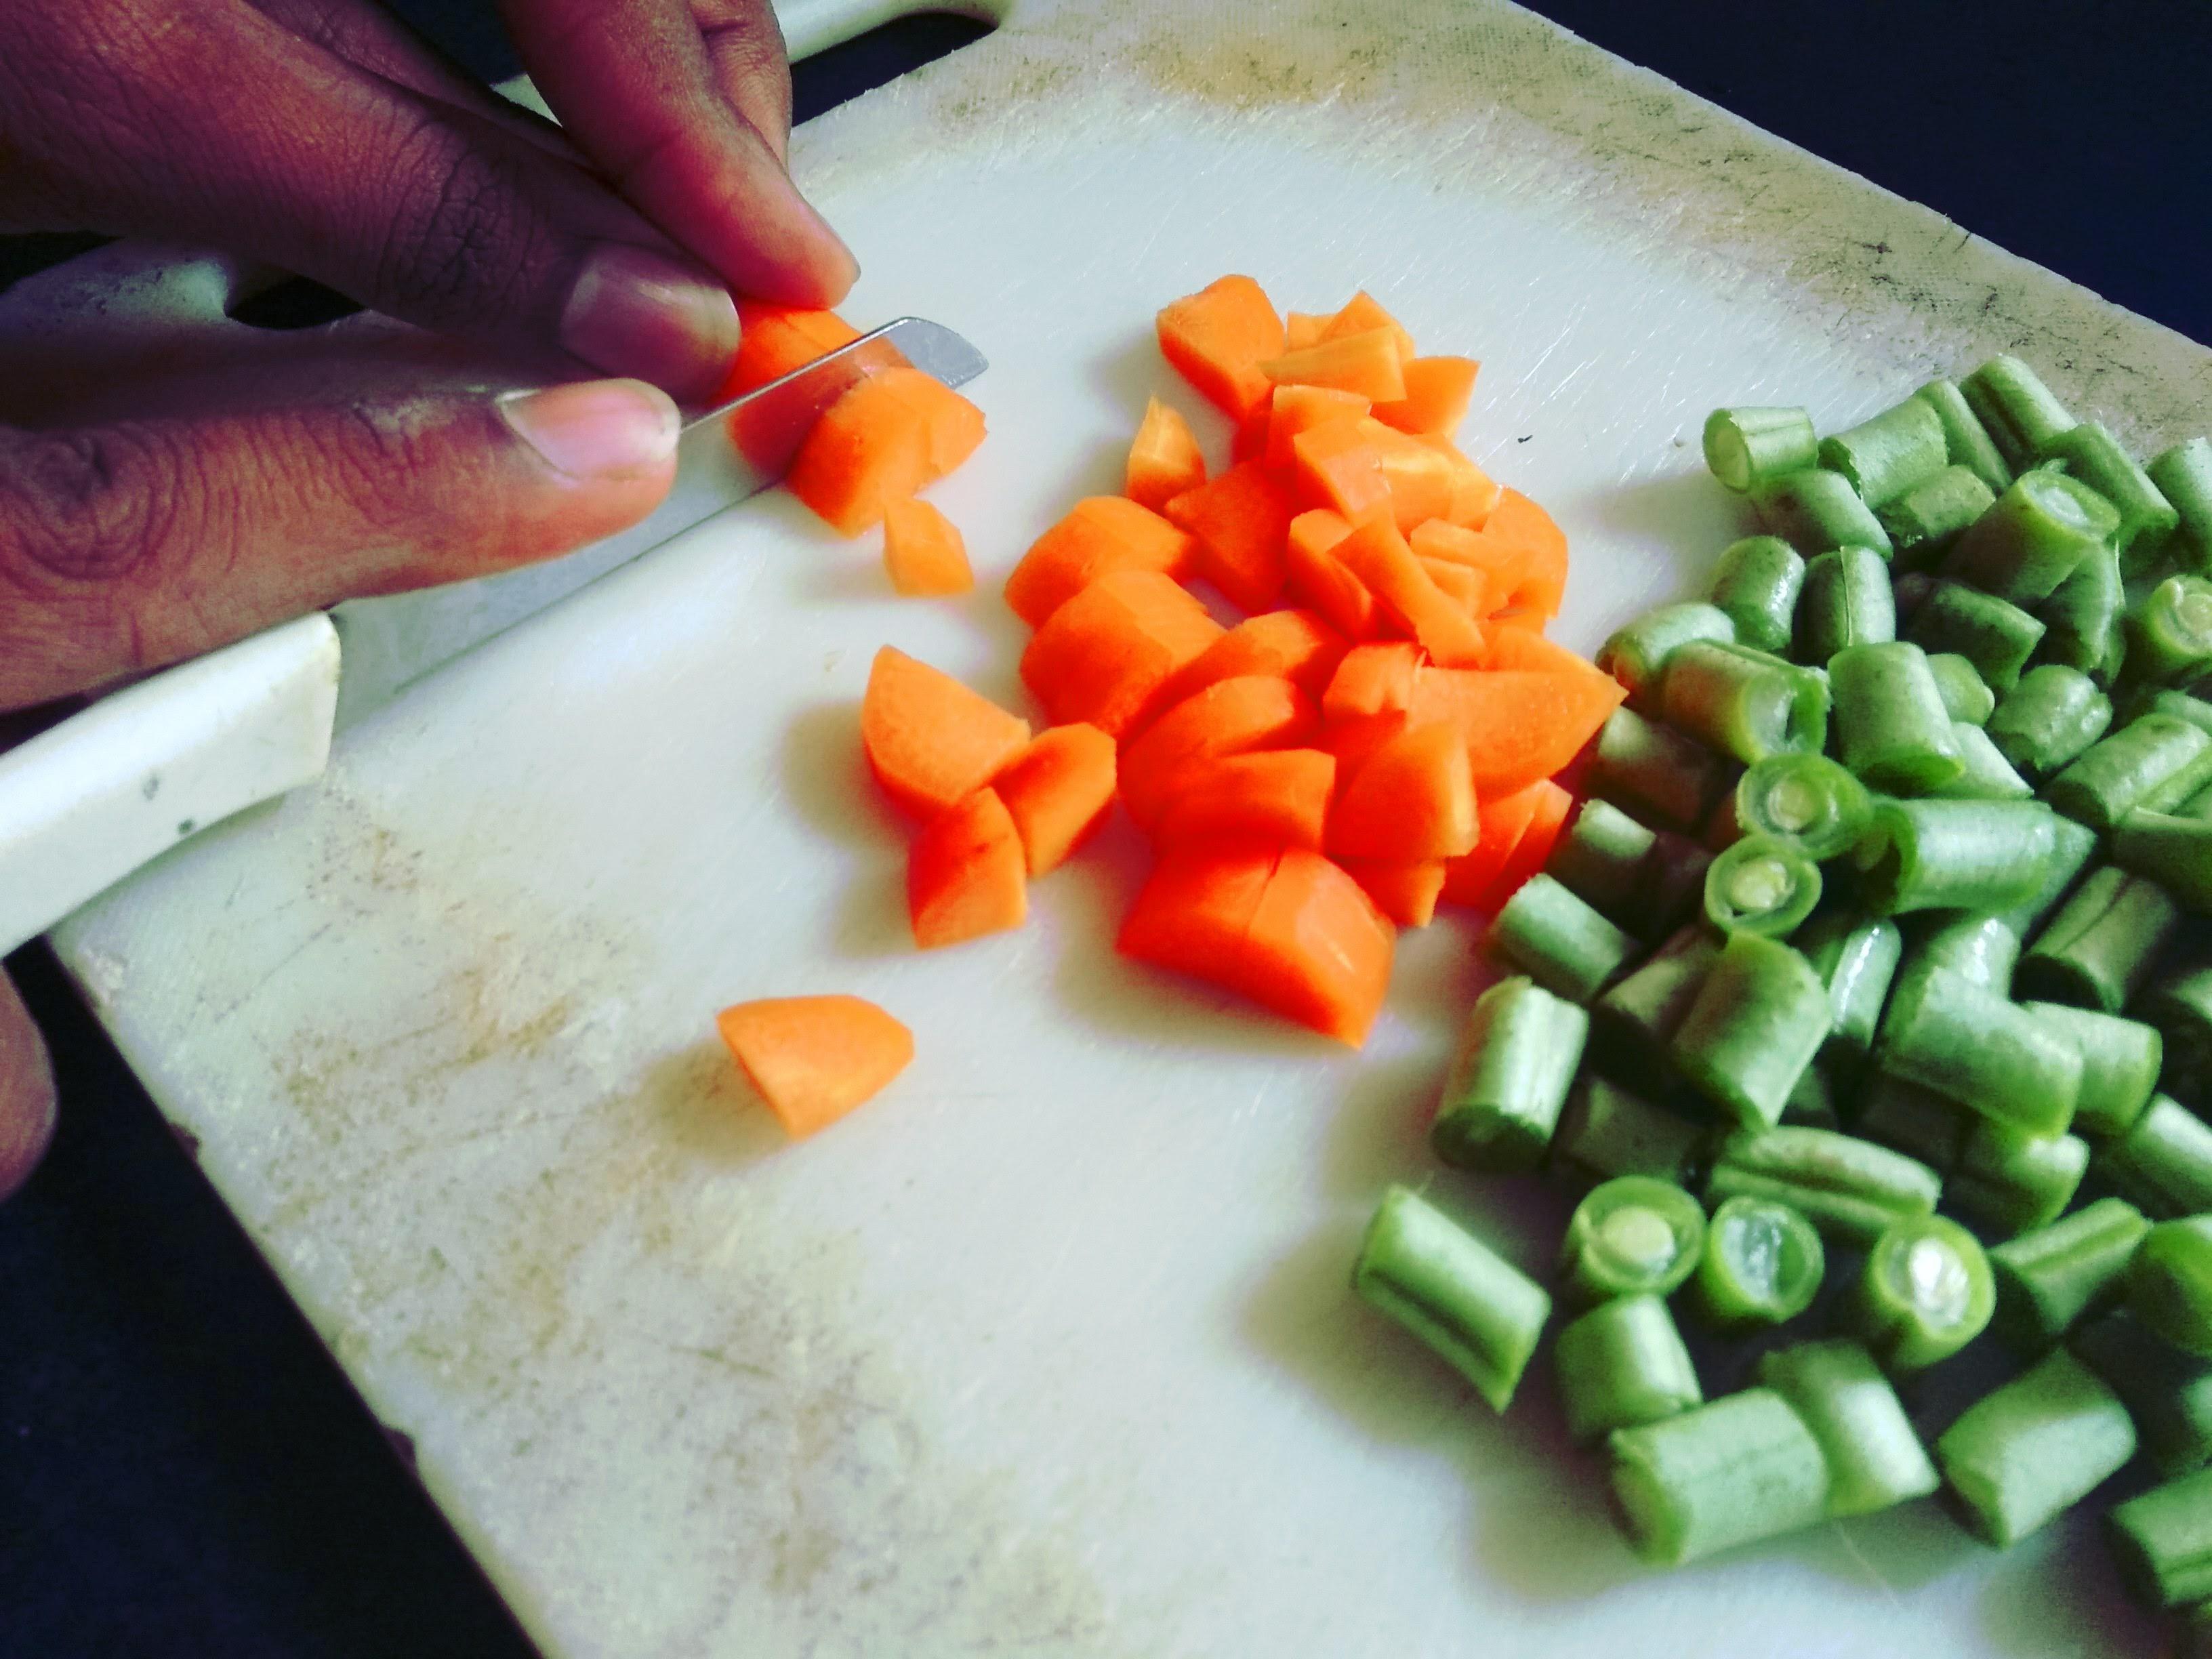 Picture of Prepare Veggies